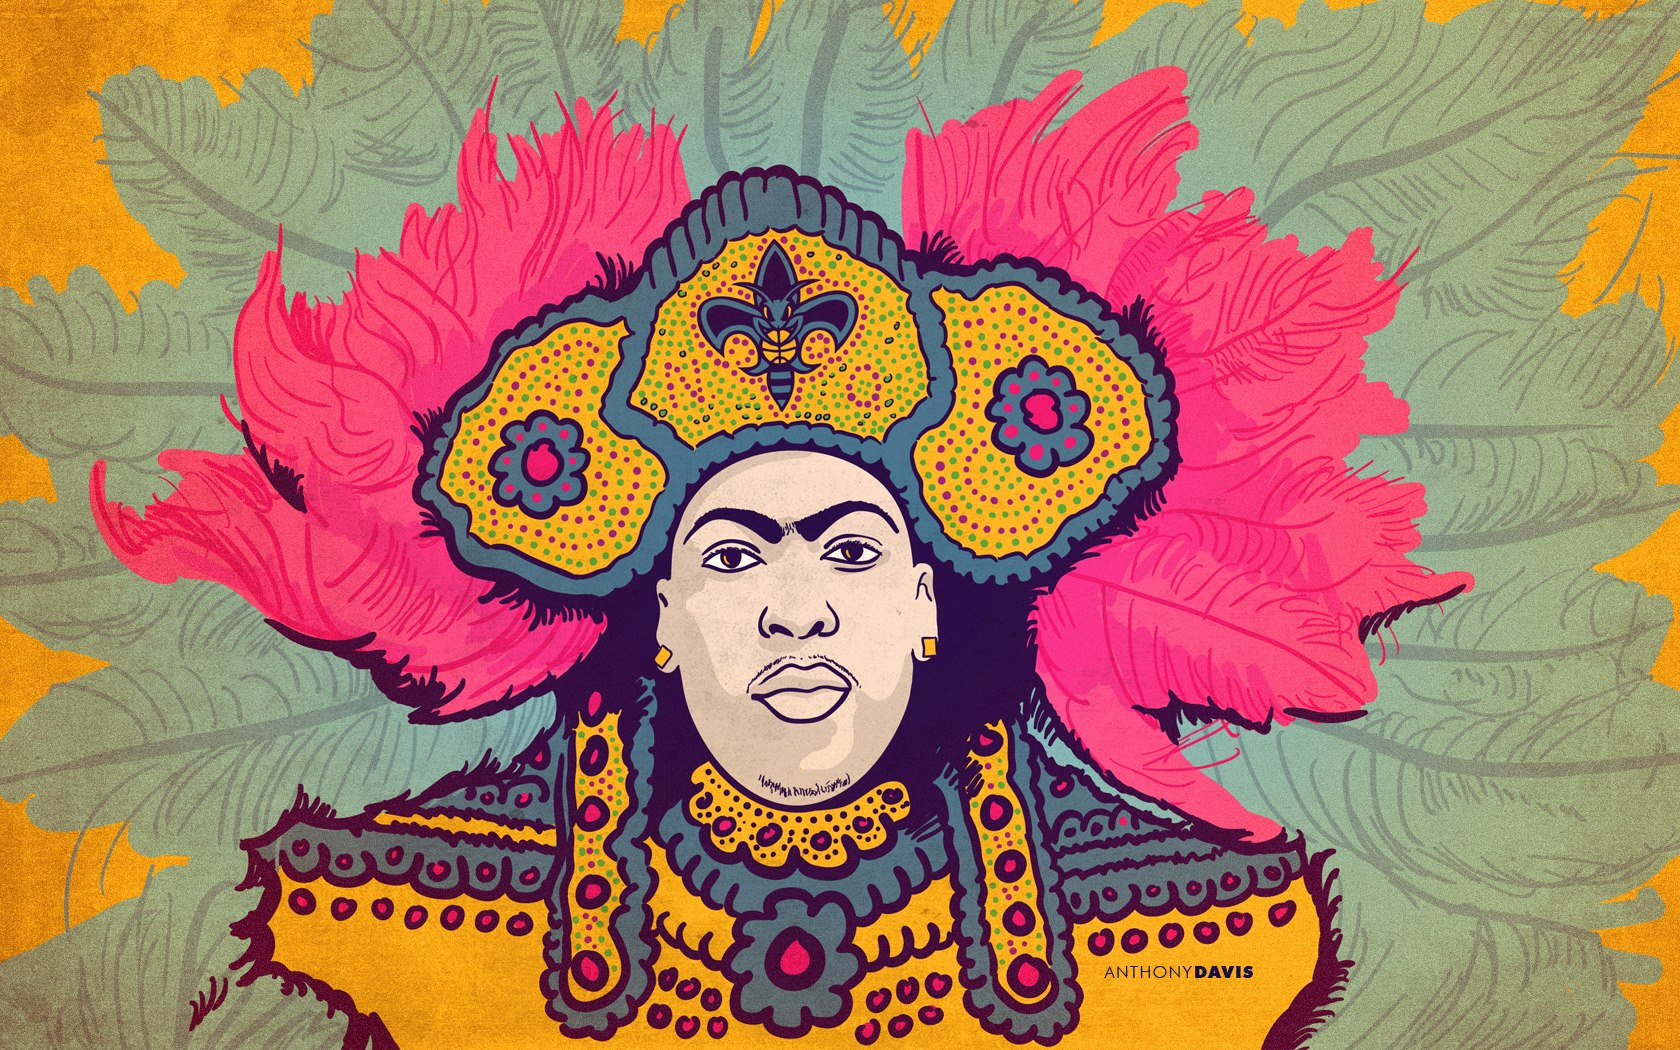 Anthony Davis / Mardi Gras Indian